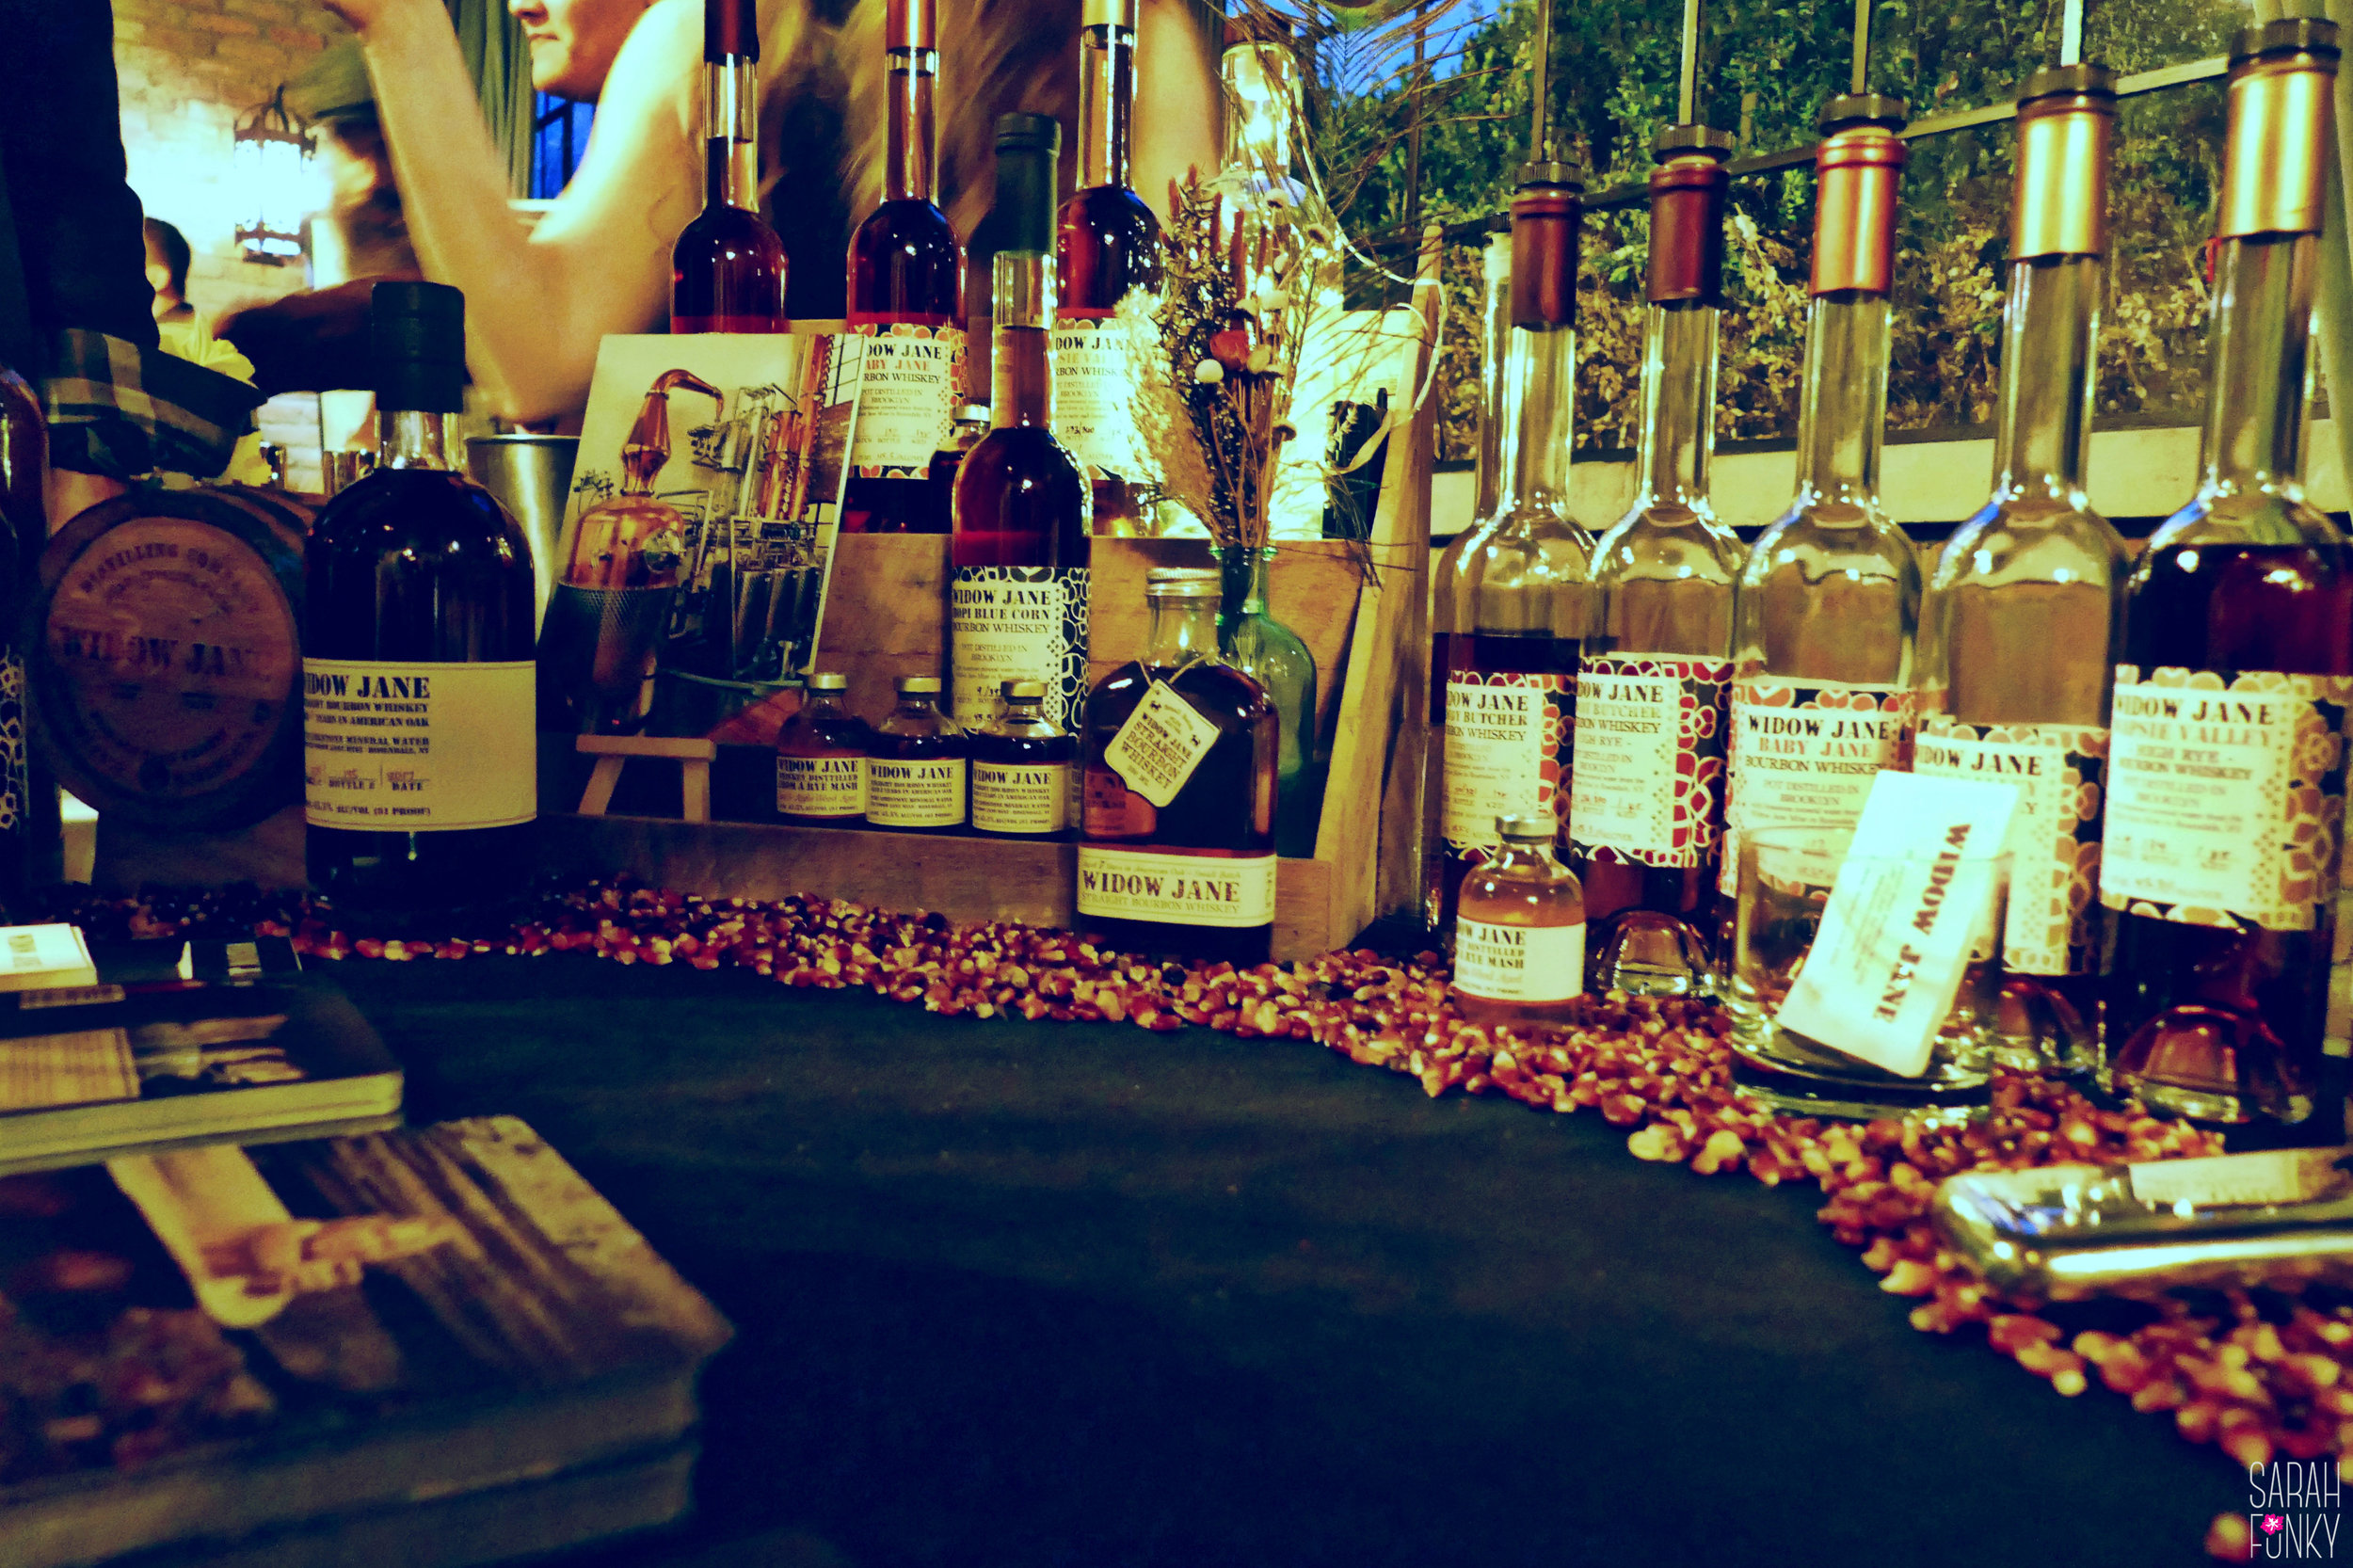 Widow Jane Heirloom Bourbon Whiskeys on display